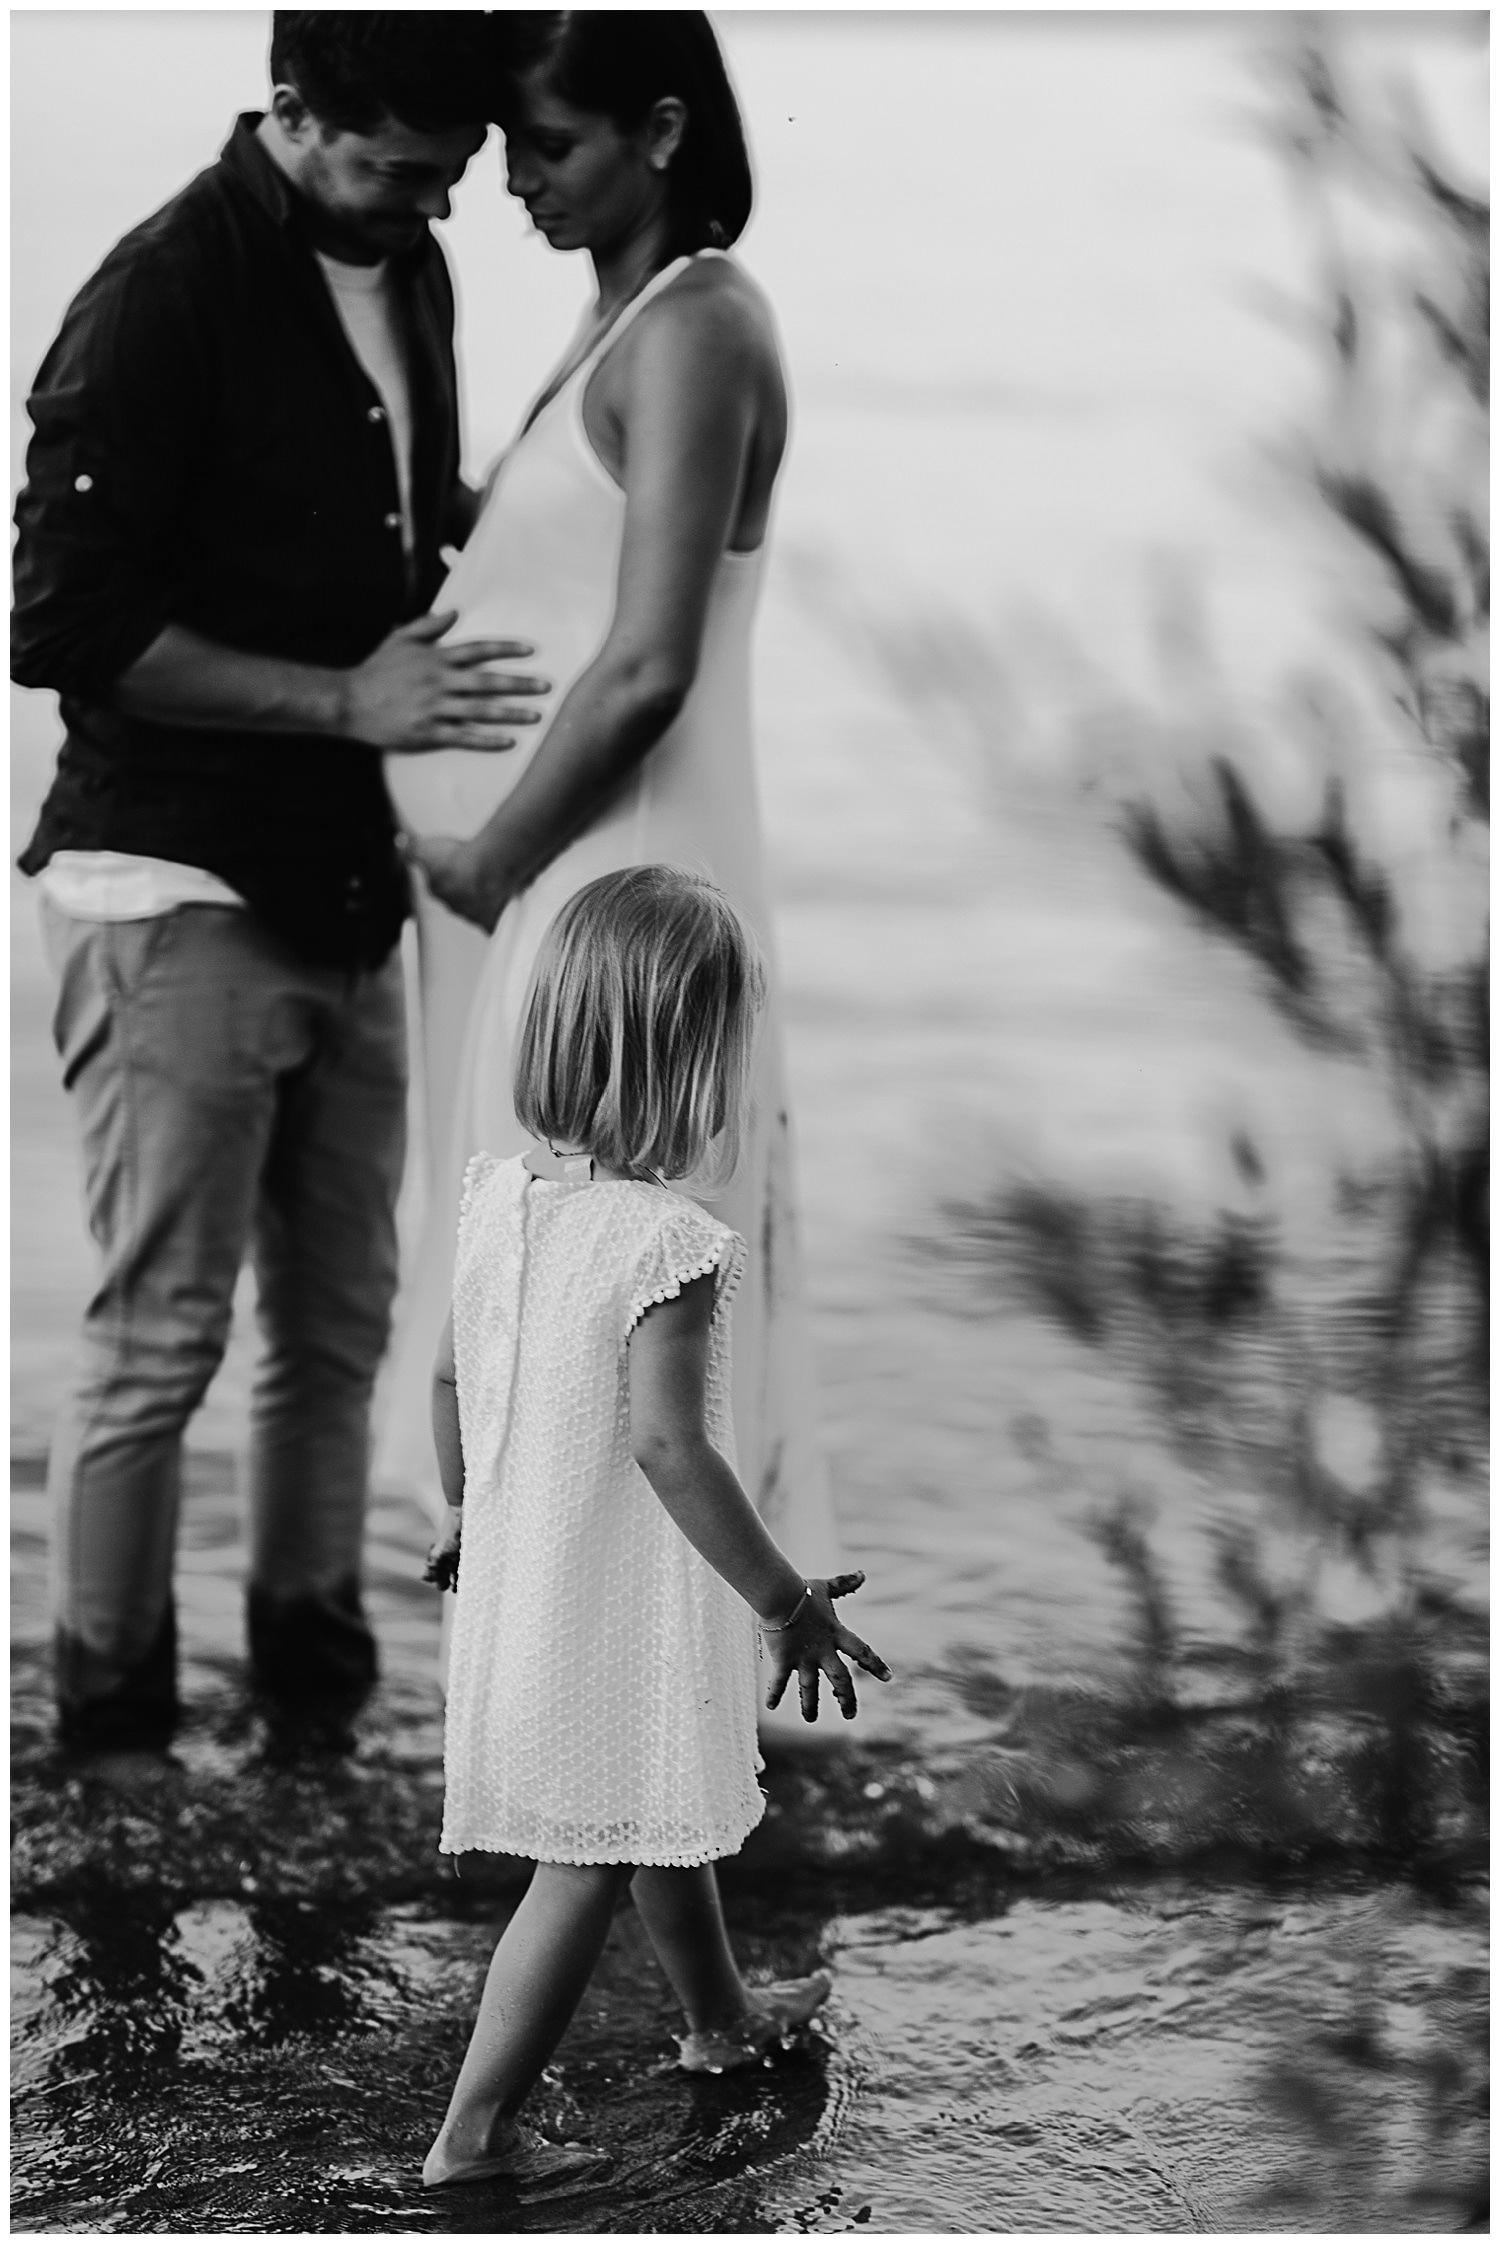 Schwangerschaft, Babybauch, Babybauchfotograf, Babybauch Foto, Schwanger, Fotograf Ostschweiz